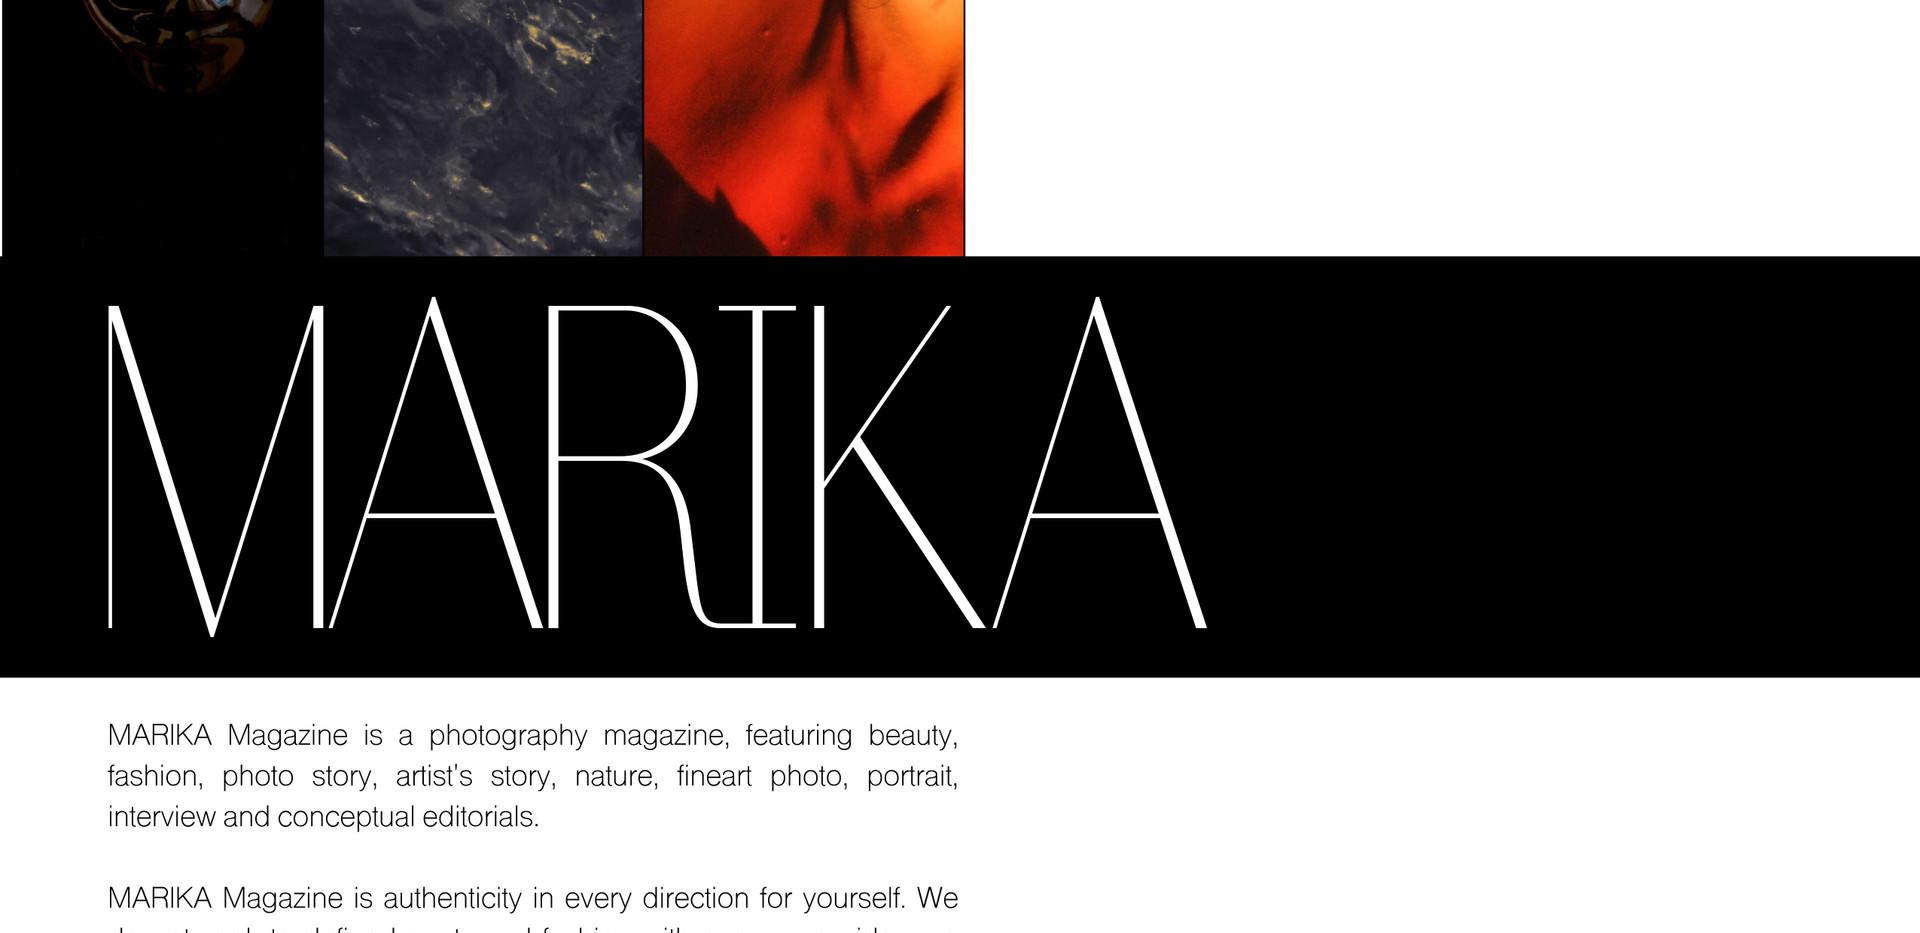 MARIKA MAGAZINE ISSUE 357 -  FINE-ART-2